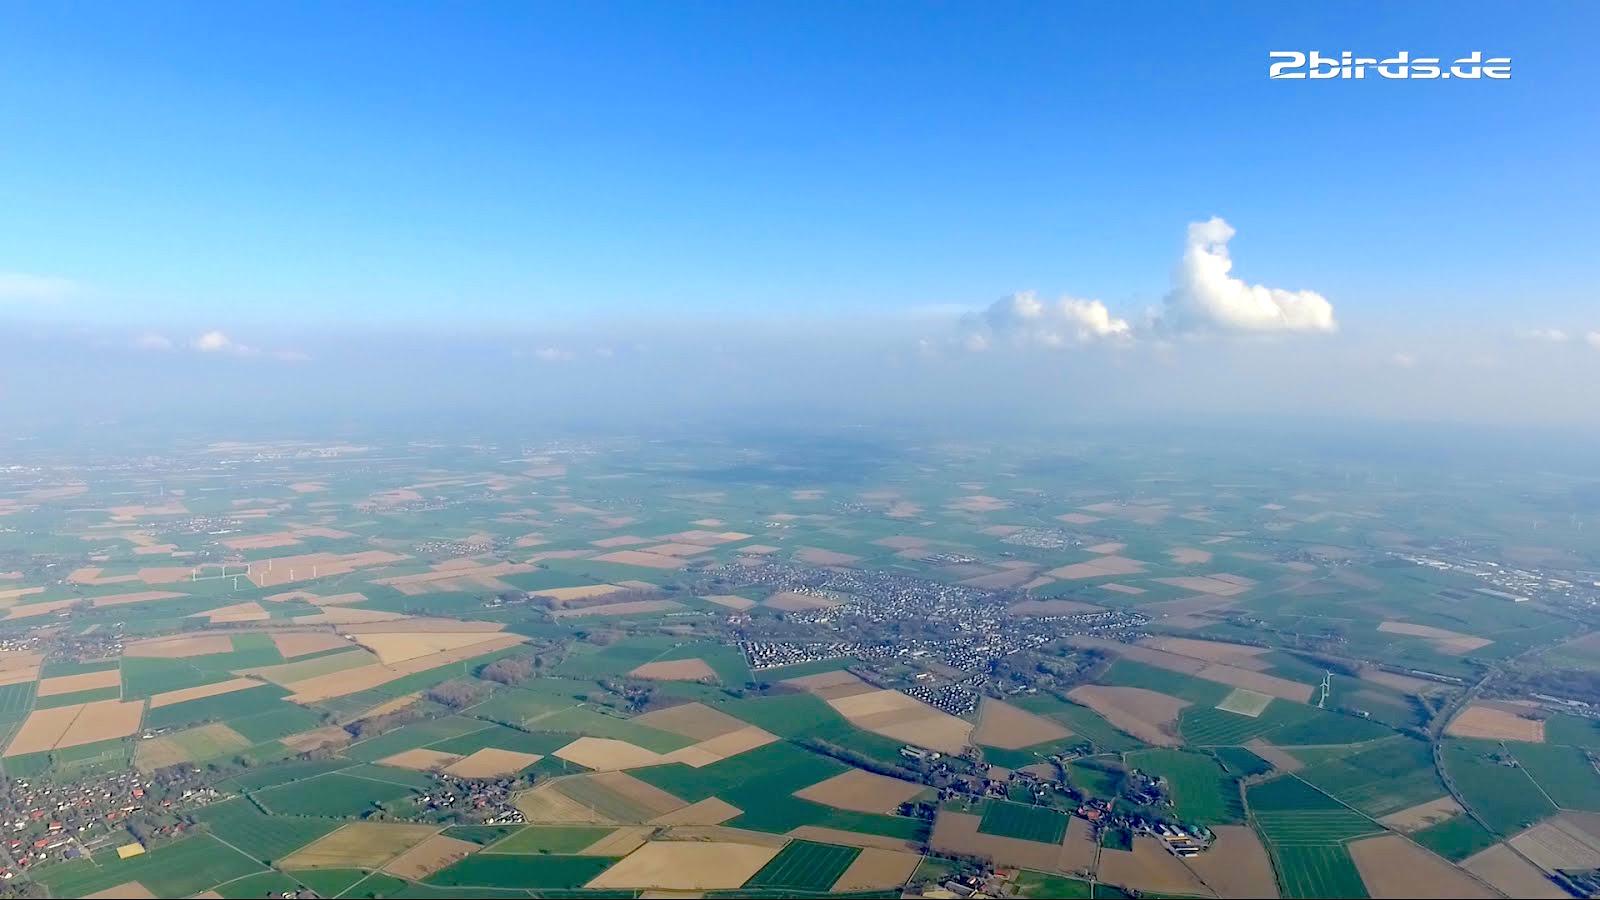 NOVA phantom goes step-towing and xc-flight in the north-west german flatlands